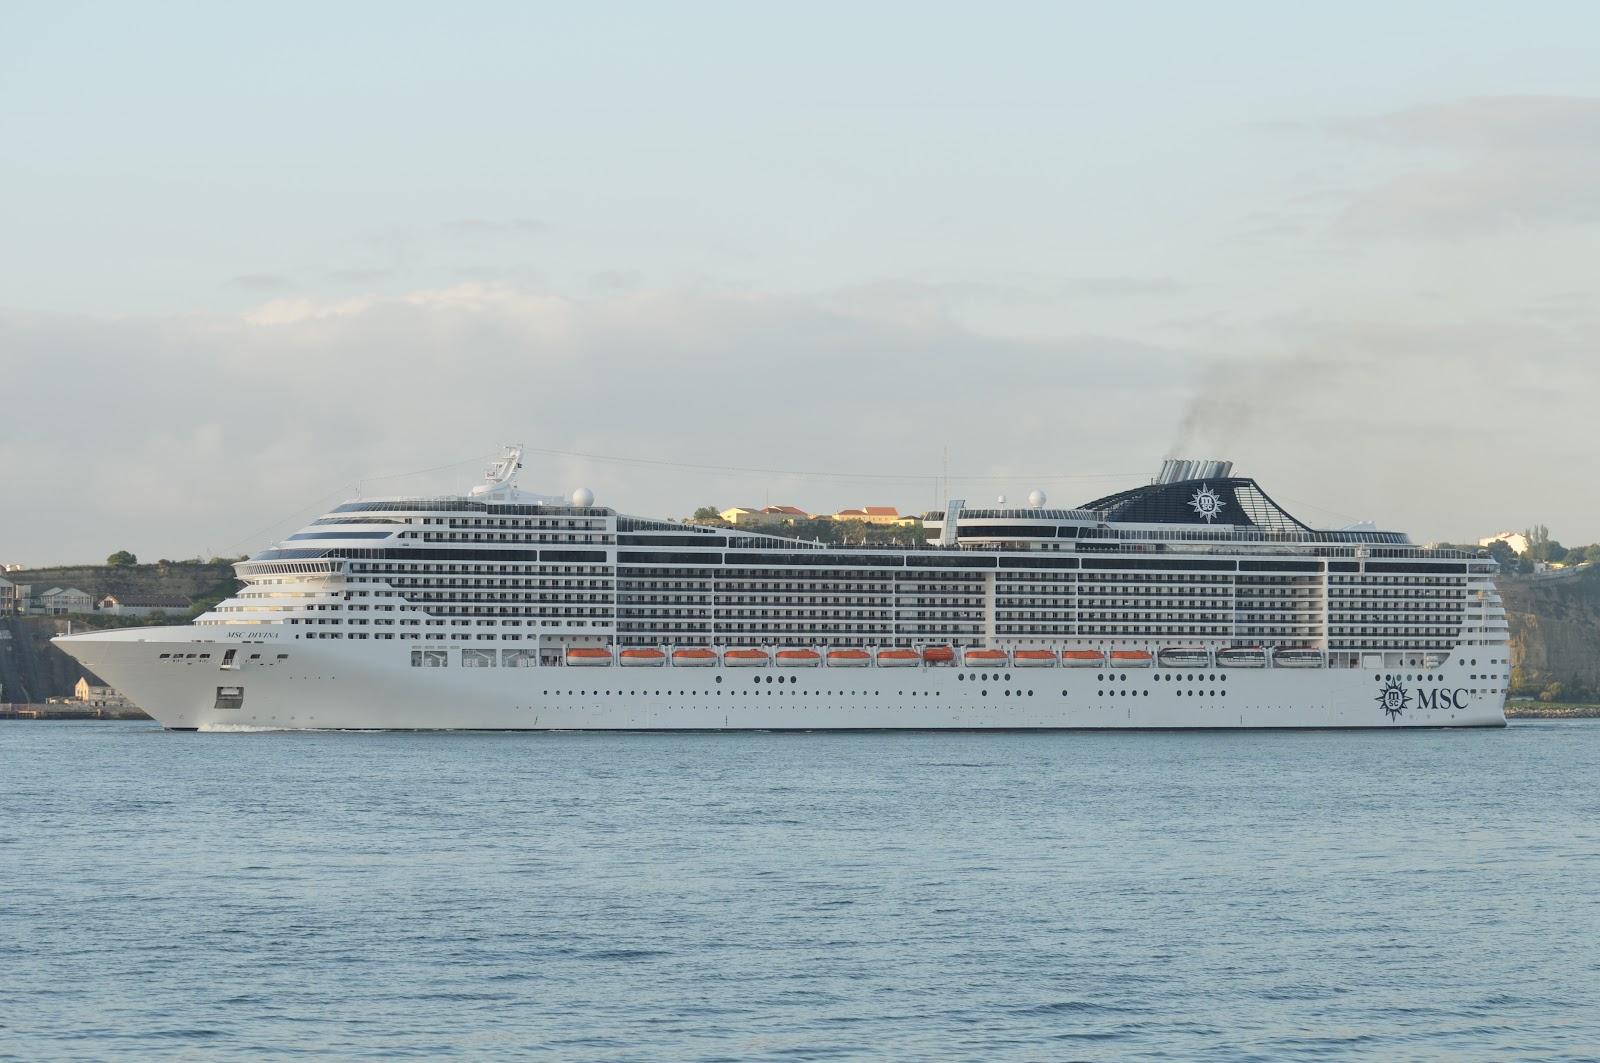 LISBON CRUISE SHIPS MSC DIVINA In Lisbon